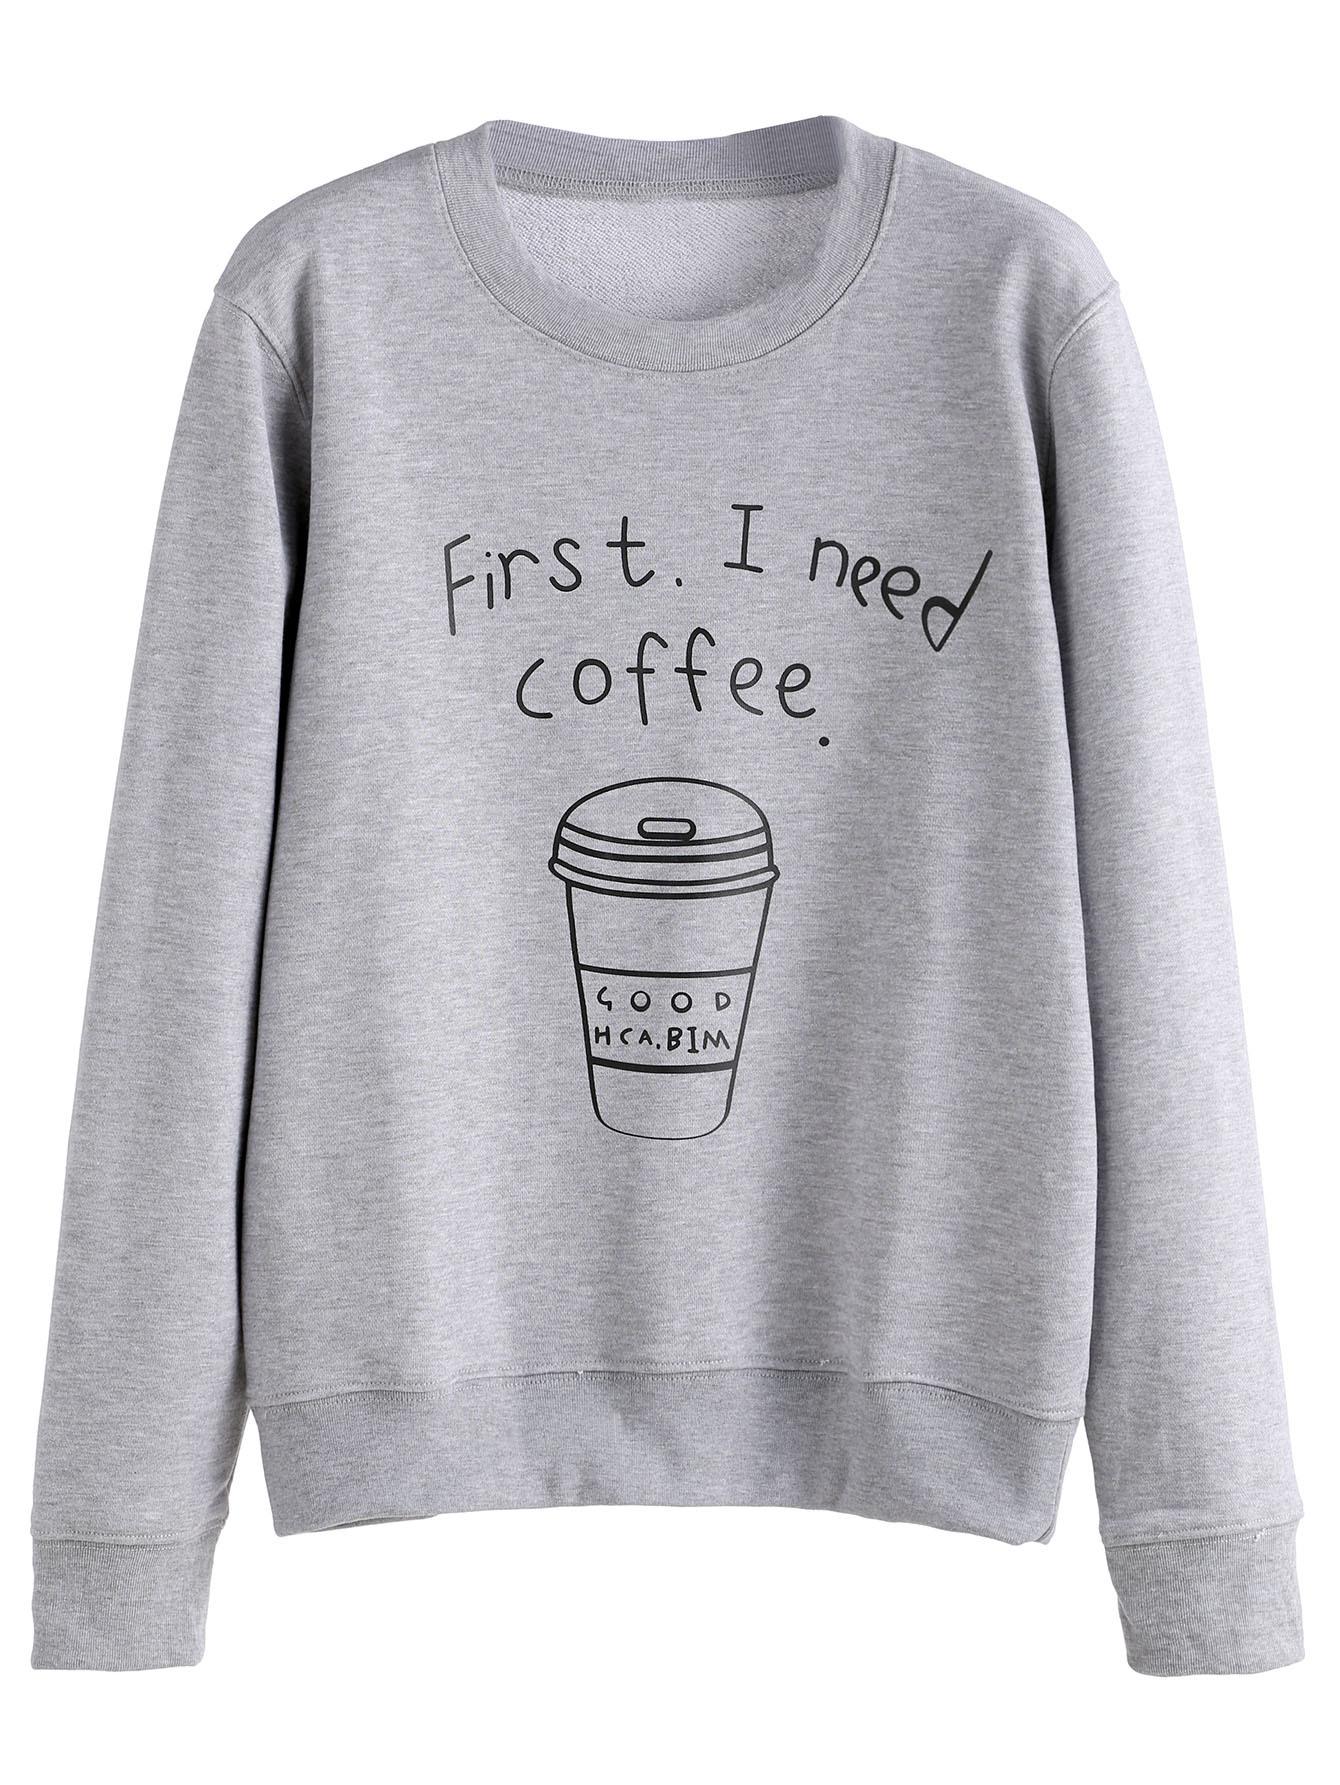 Grey Coffee Cup Letters Print SweatshirtGrey Coffee Cup Letters Print Sweatshirt<br><br>color: Grey<br>size: L,M,S,XL,XXL